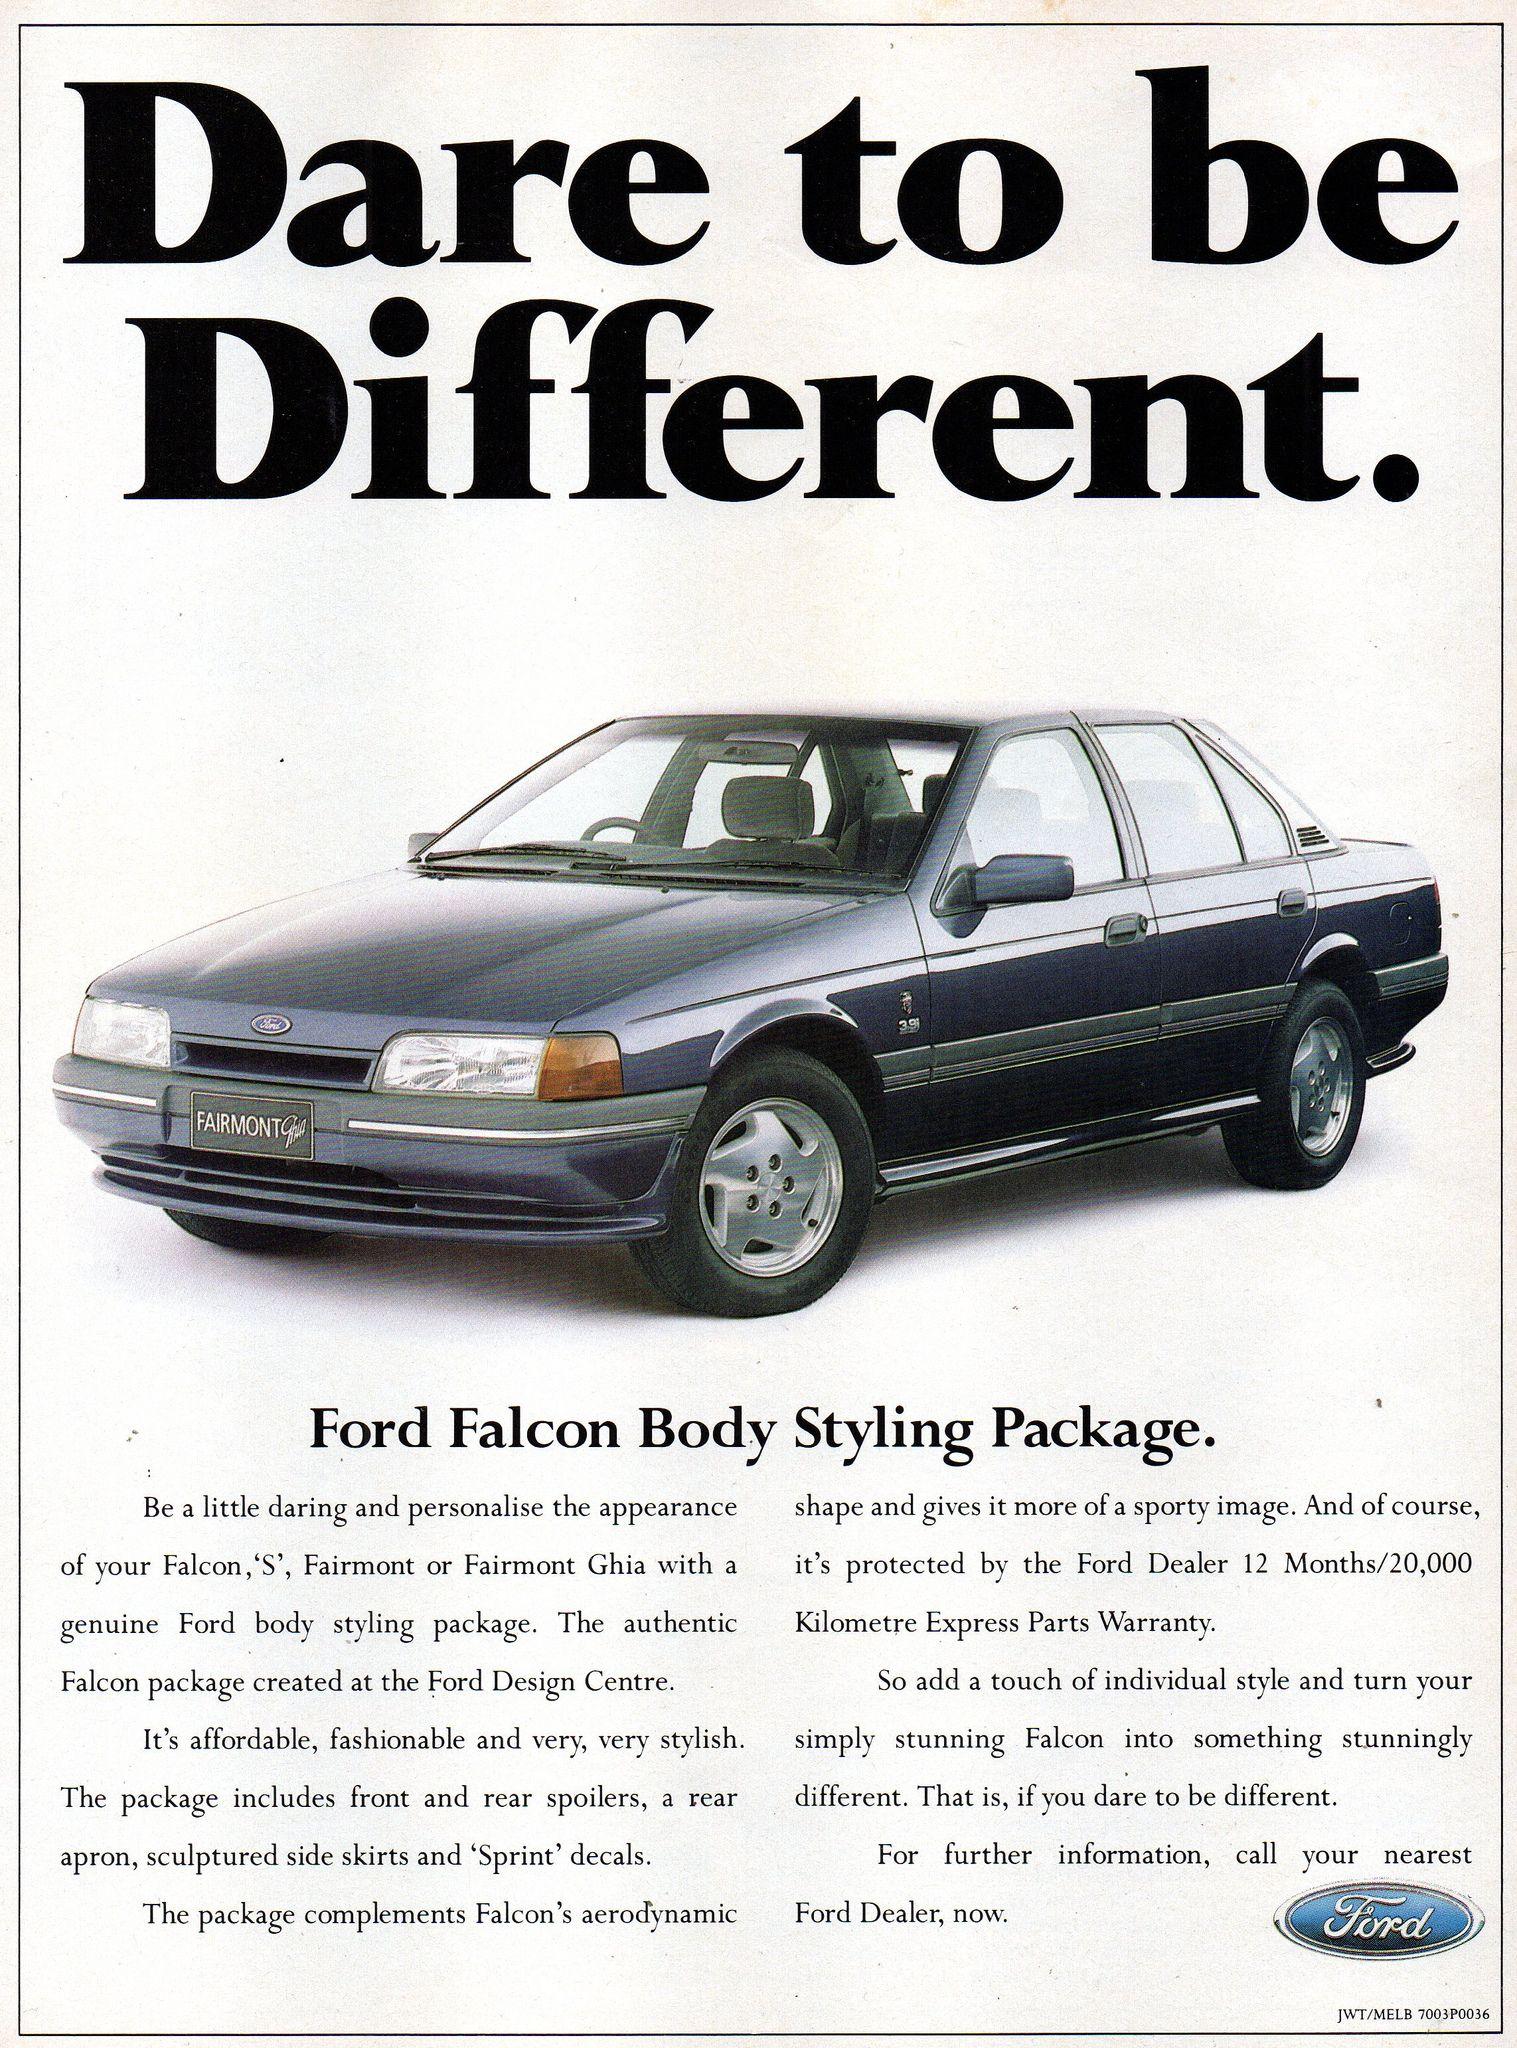 1989 Ea Ford Falcon S Fairmont Or Fairmont Ghia Genuine Body Styling Package Aussie Original Magazine Advertisement Ford Falcon Australian Cars Ford